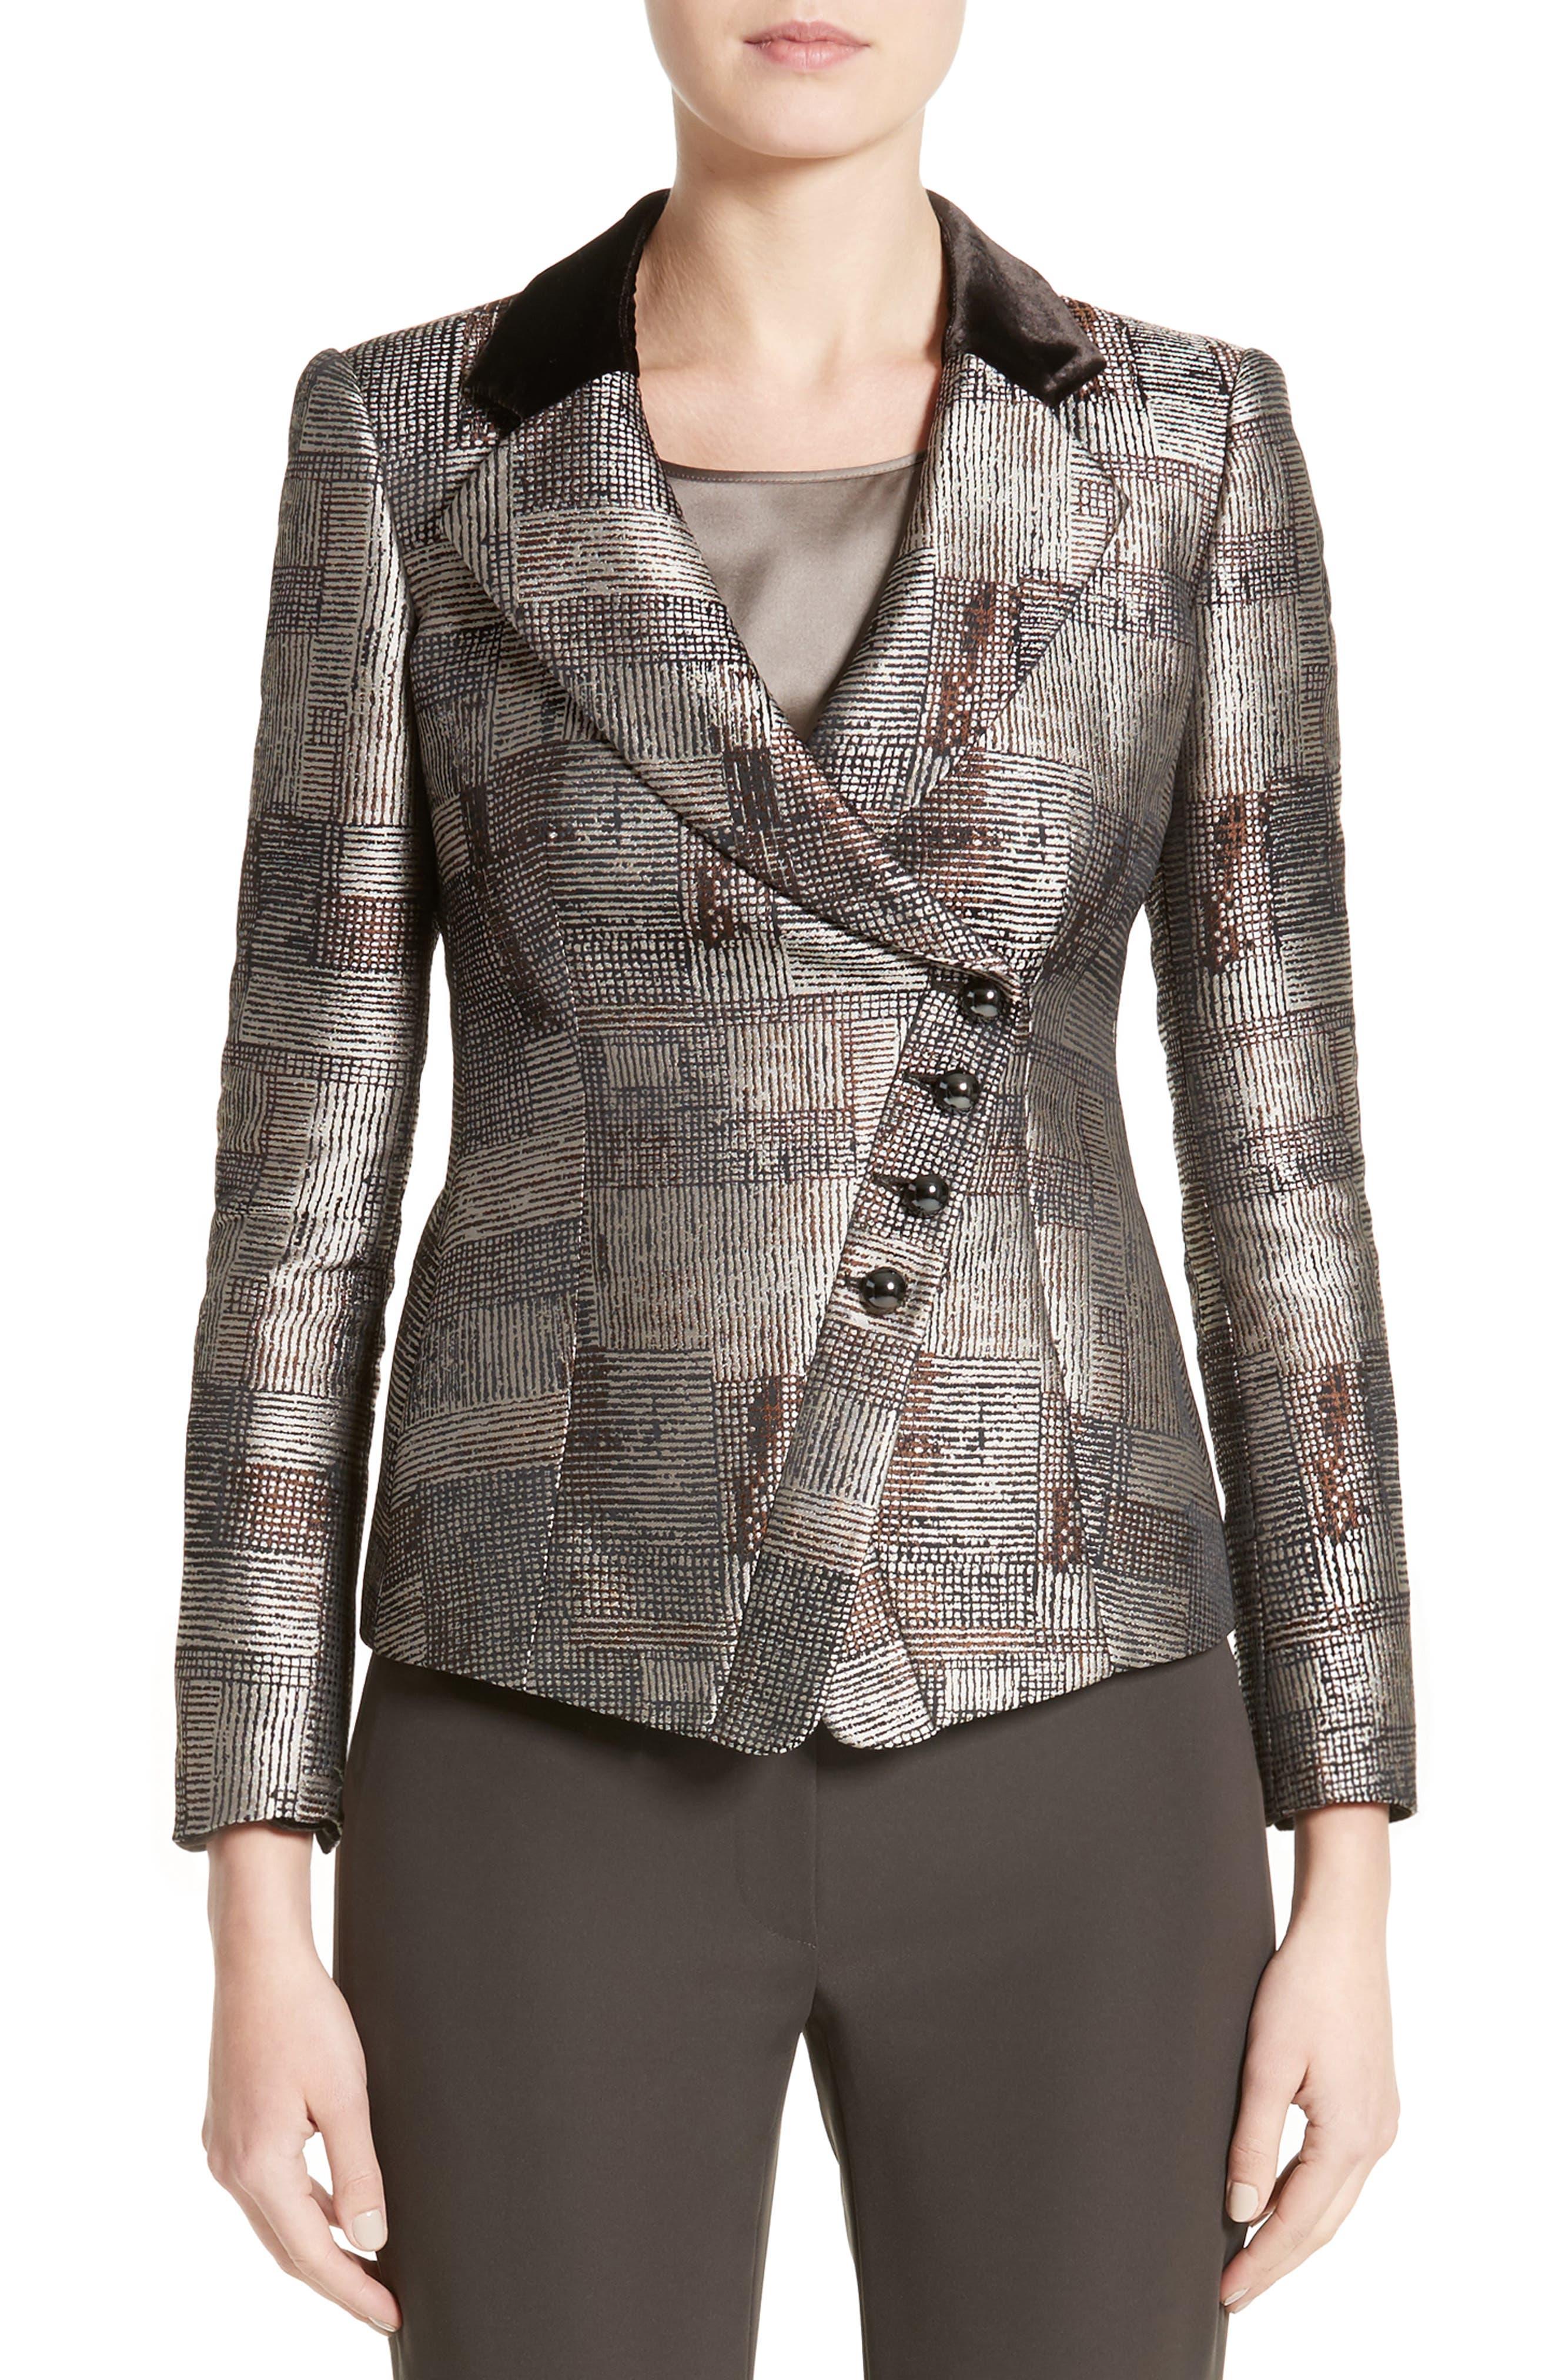 Alternate Image 1 Selected - Armani Collezioni Panel Jacquard Asymmetrical Jacket